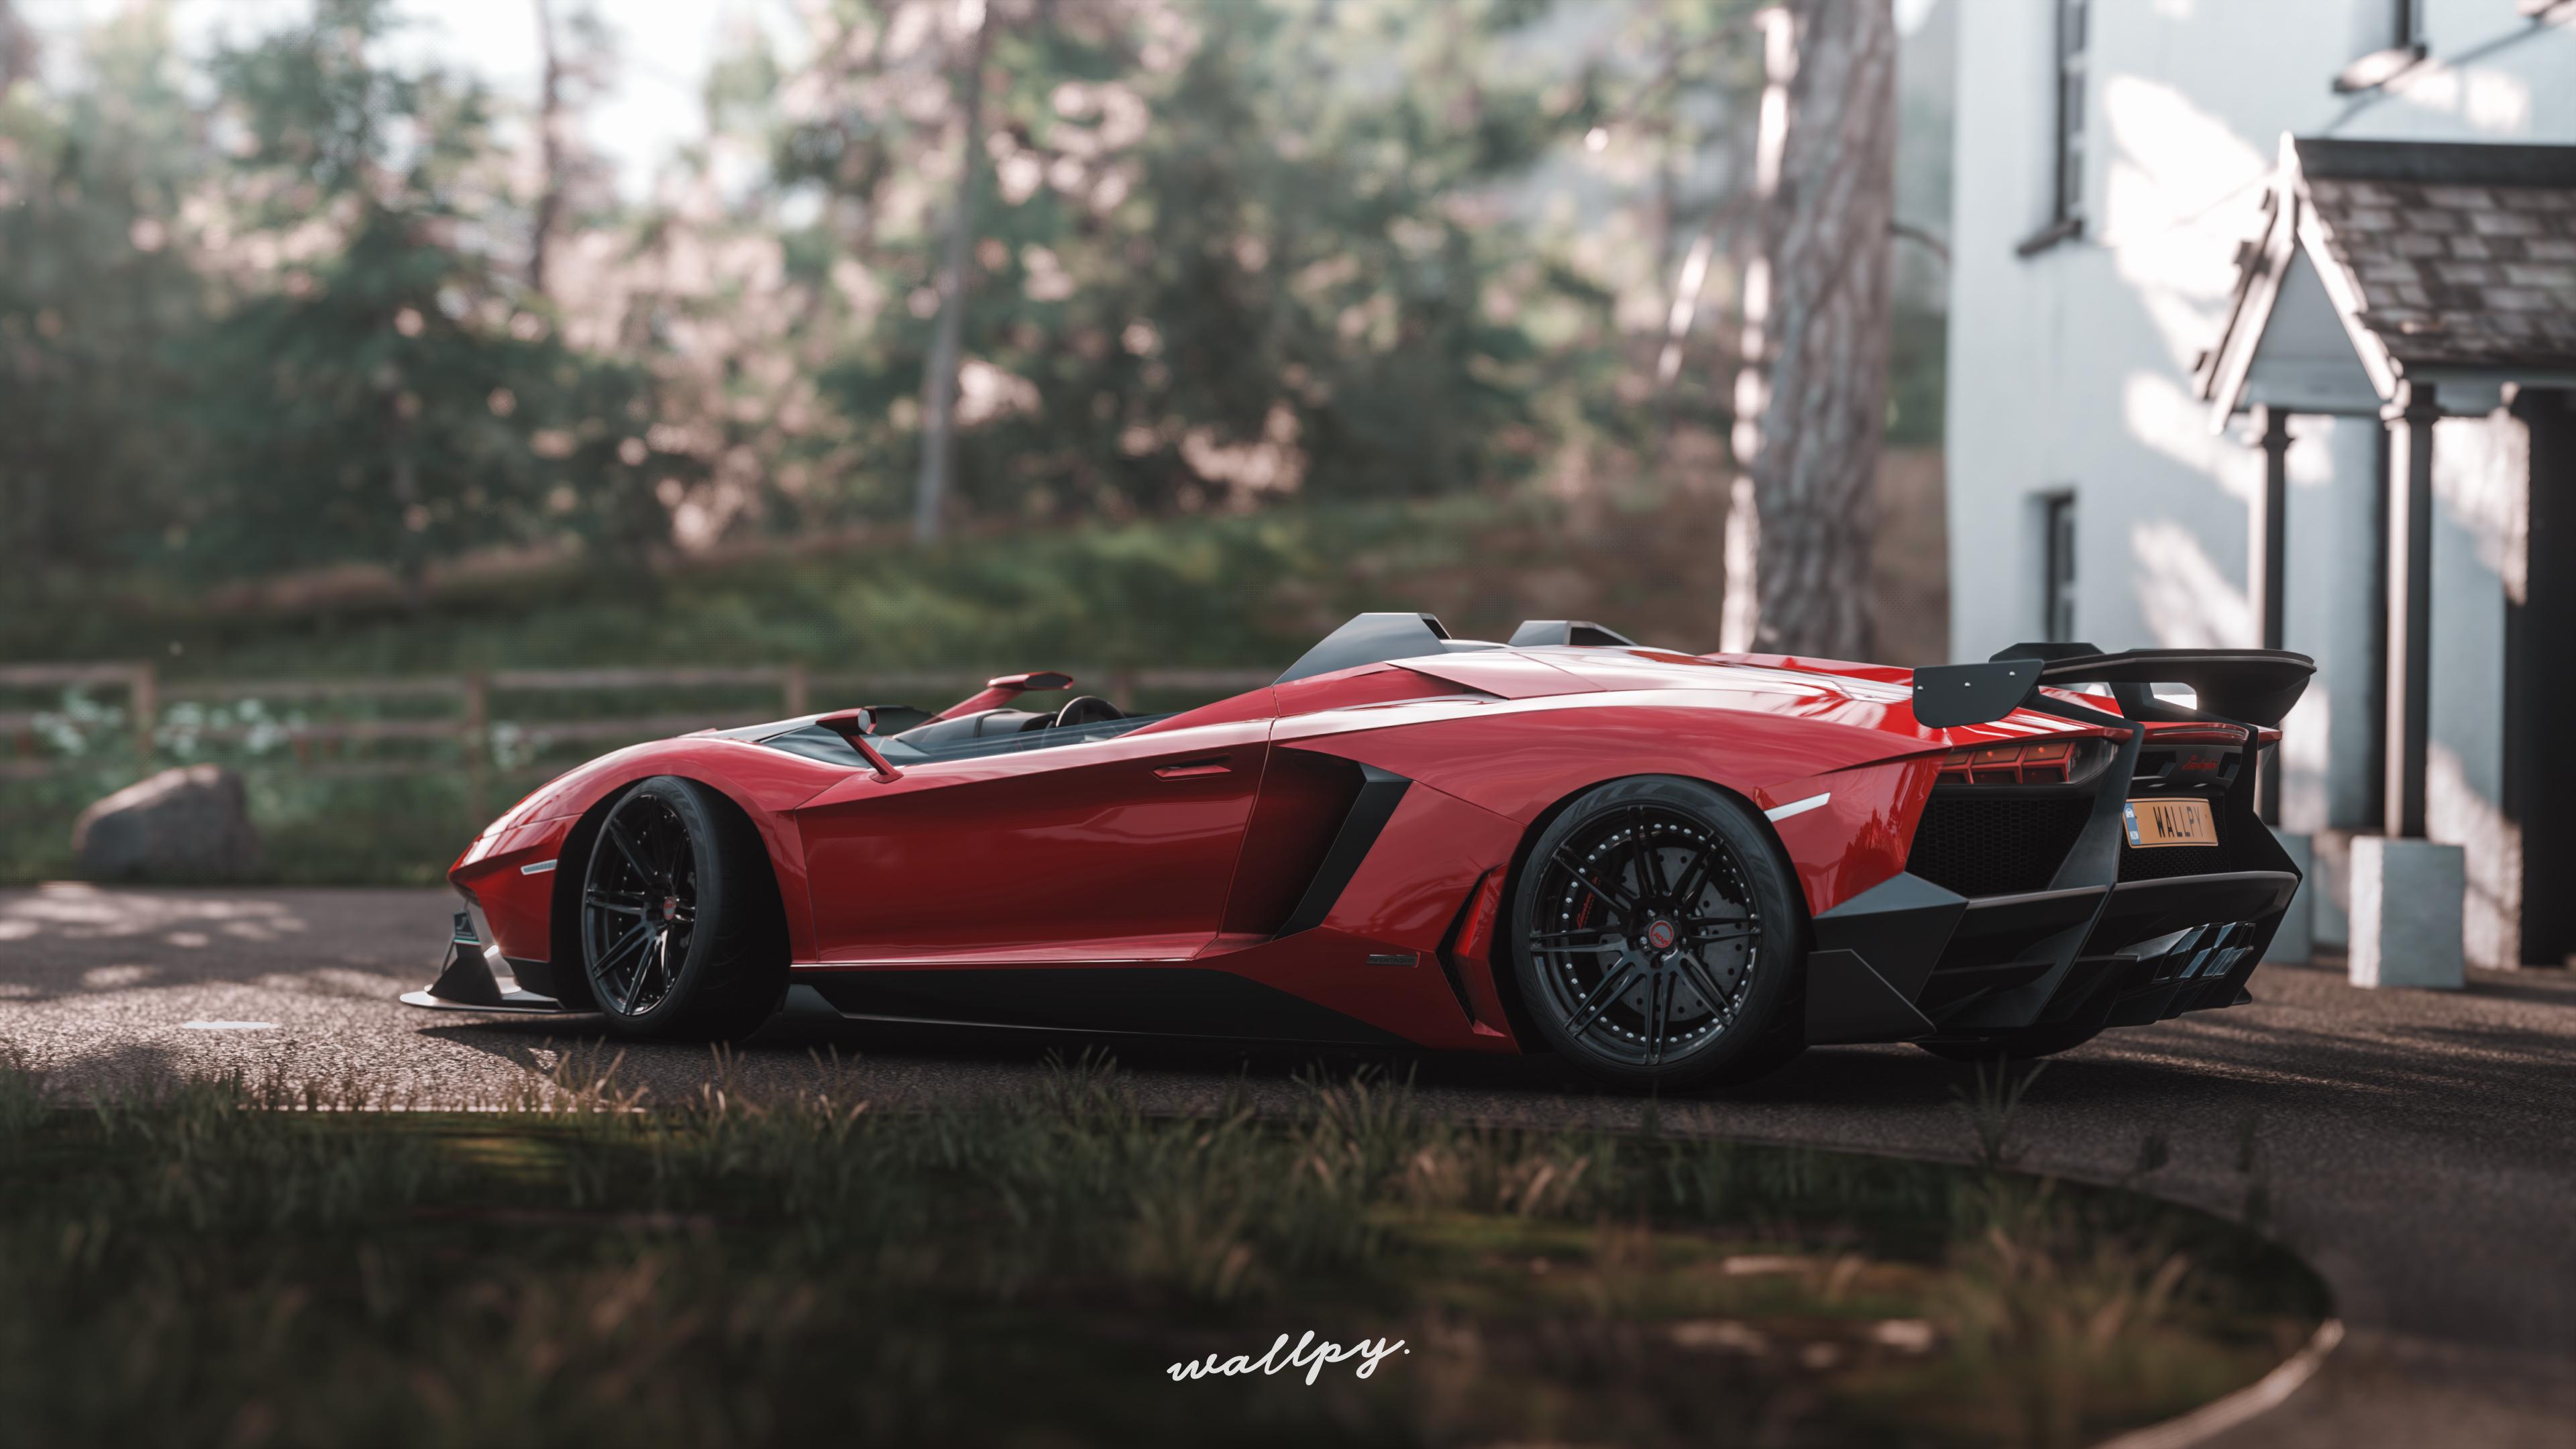 Forza Horizon 4 Wallpaper: Lamborghini Aventador Sv Forza Horizon 4k, HD Games, 4k